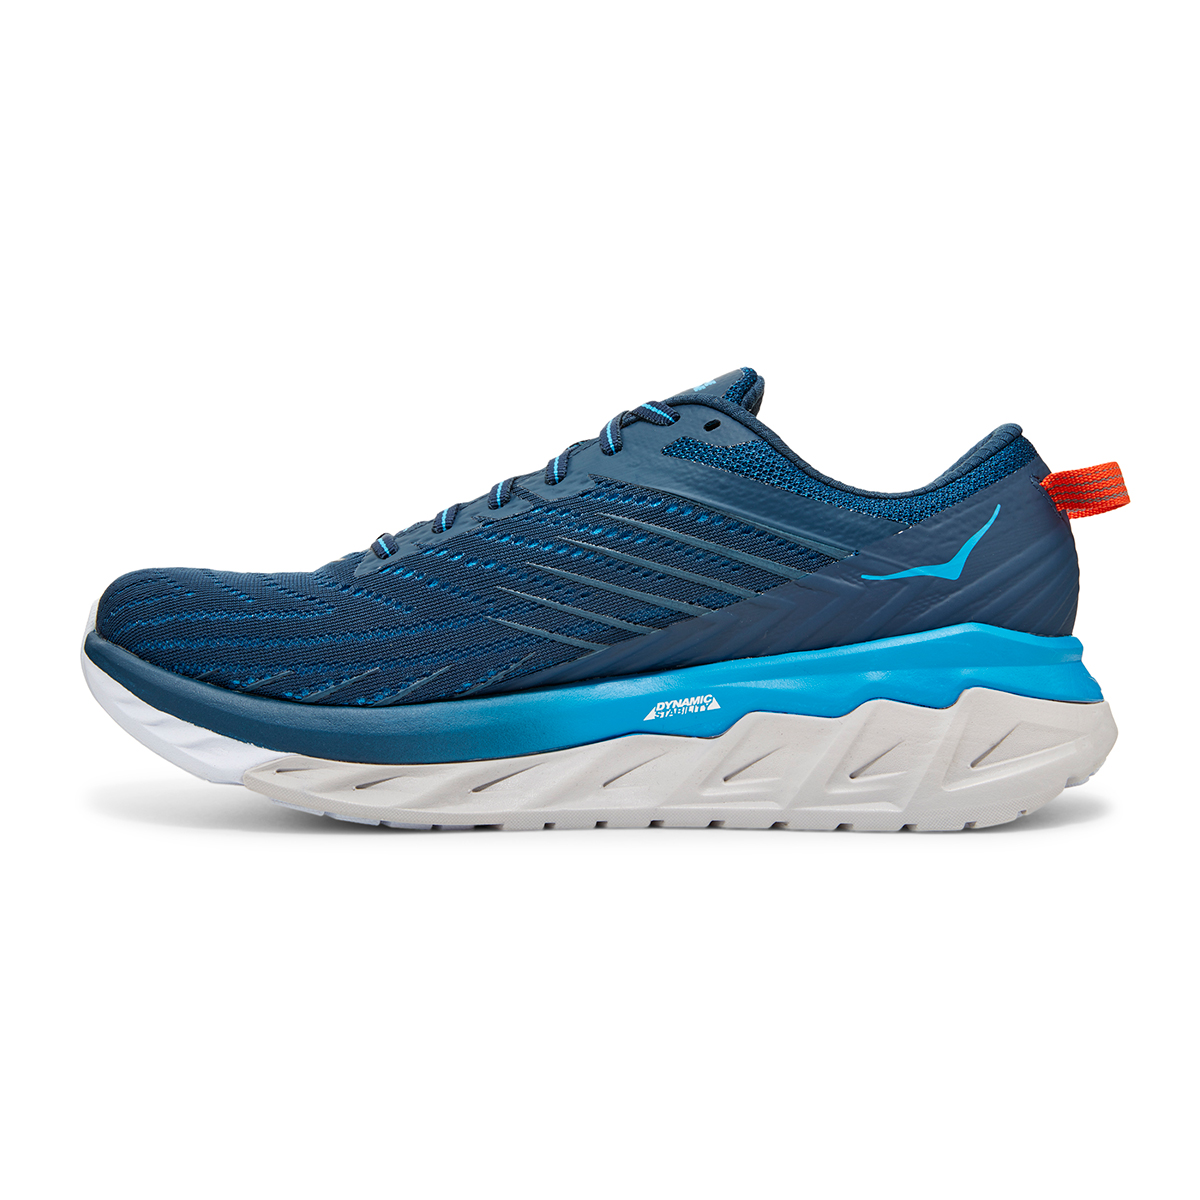 Men's Hoka One One Arahi 4 Running Shoe - Color: Majolica Blue/Dresden Blue (Regular Width) - Size: 15, Majolica Blue/Dresden Blue, large, image 2